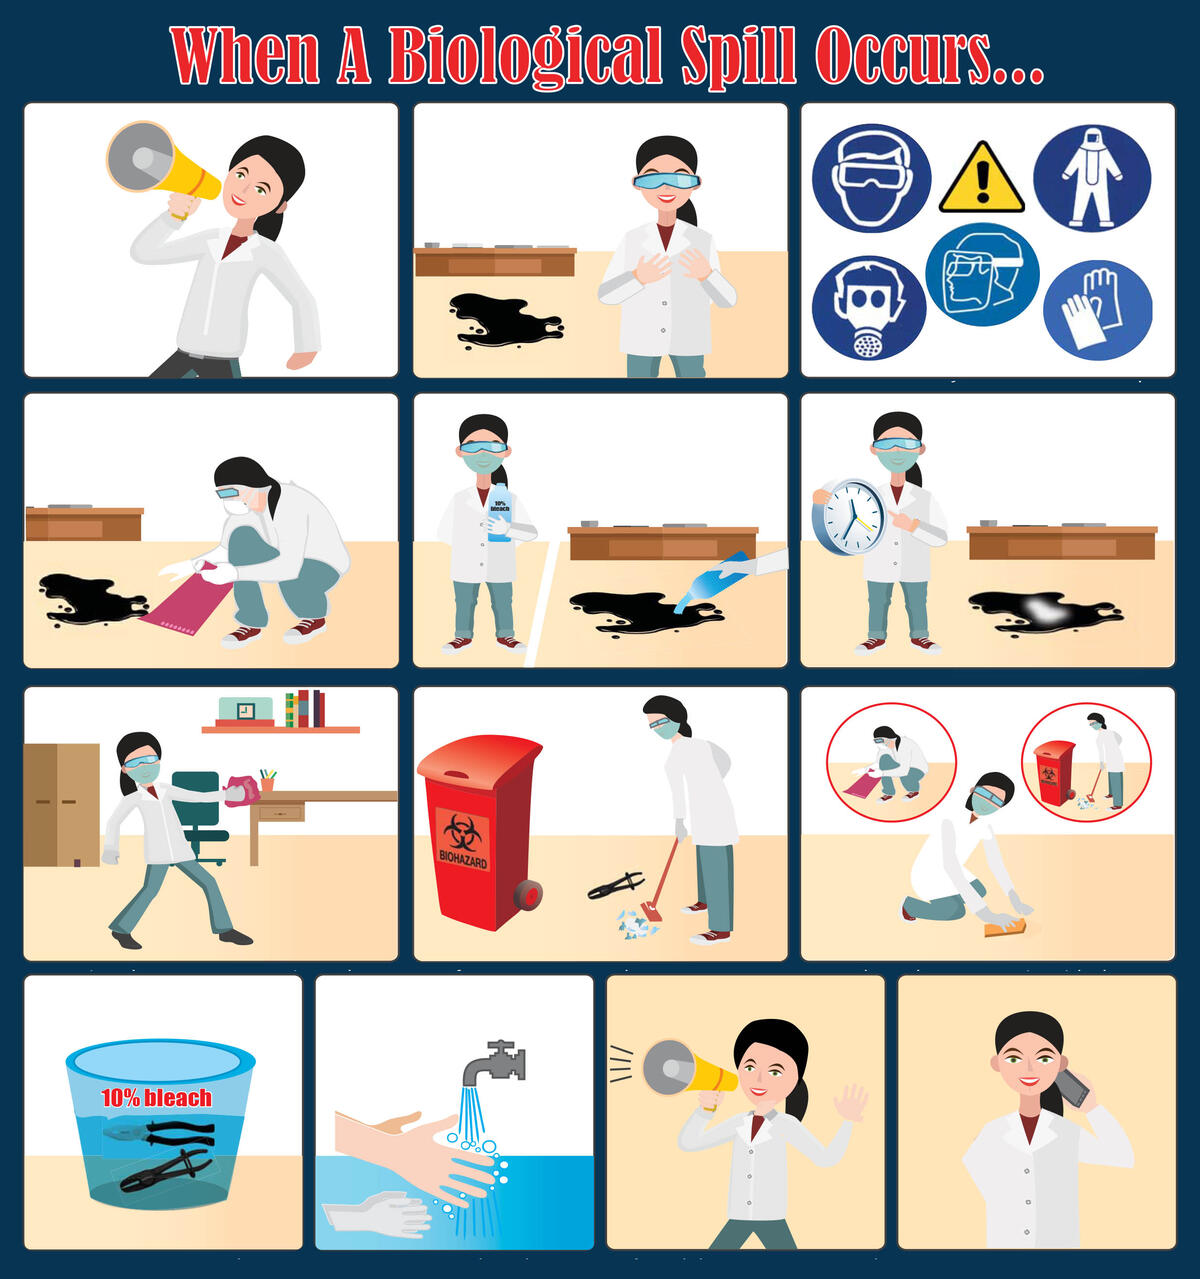 Biological Spill Kit Instructions